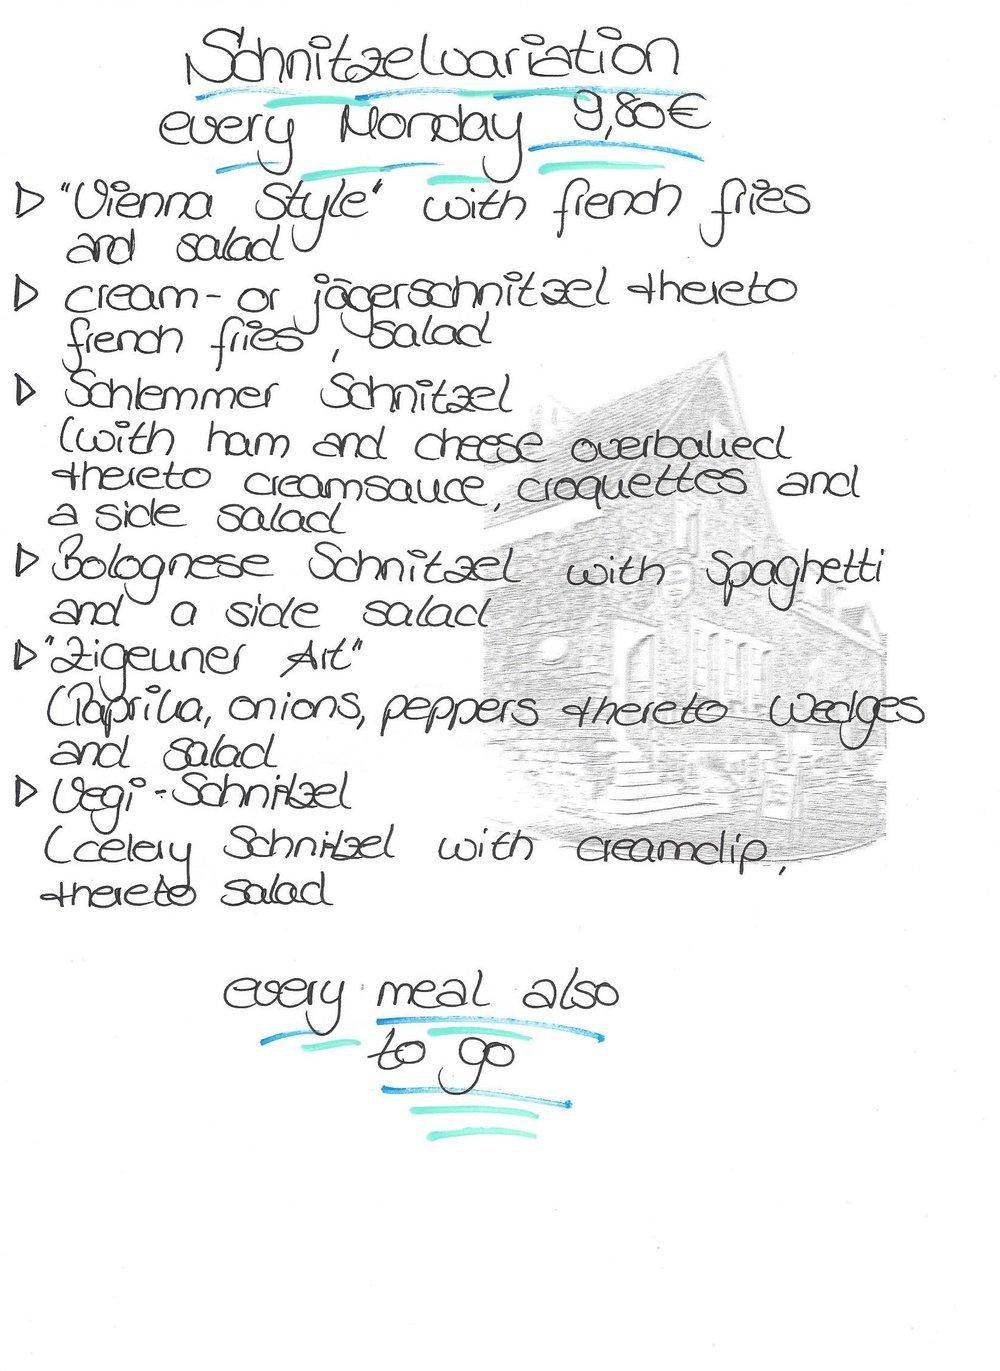 Schnitzel Specials Englisch jpeg.jpg